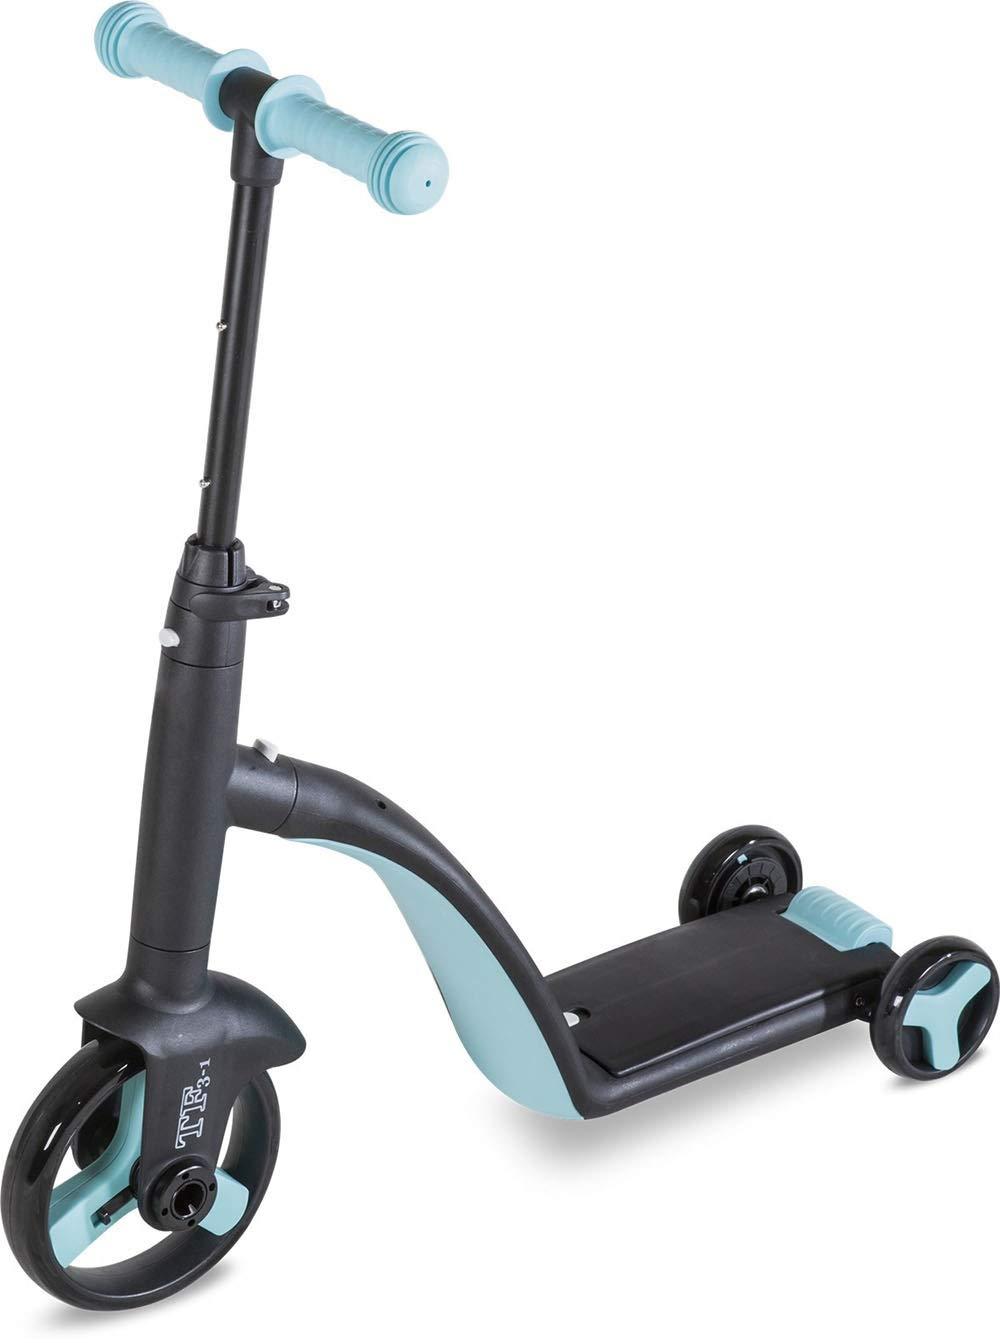 Hkkint 子供用三輪車、多機能三輪車、高さ調整可能、子供用ギフトに最適 ( Color : 青 )